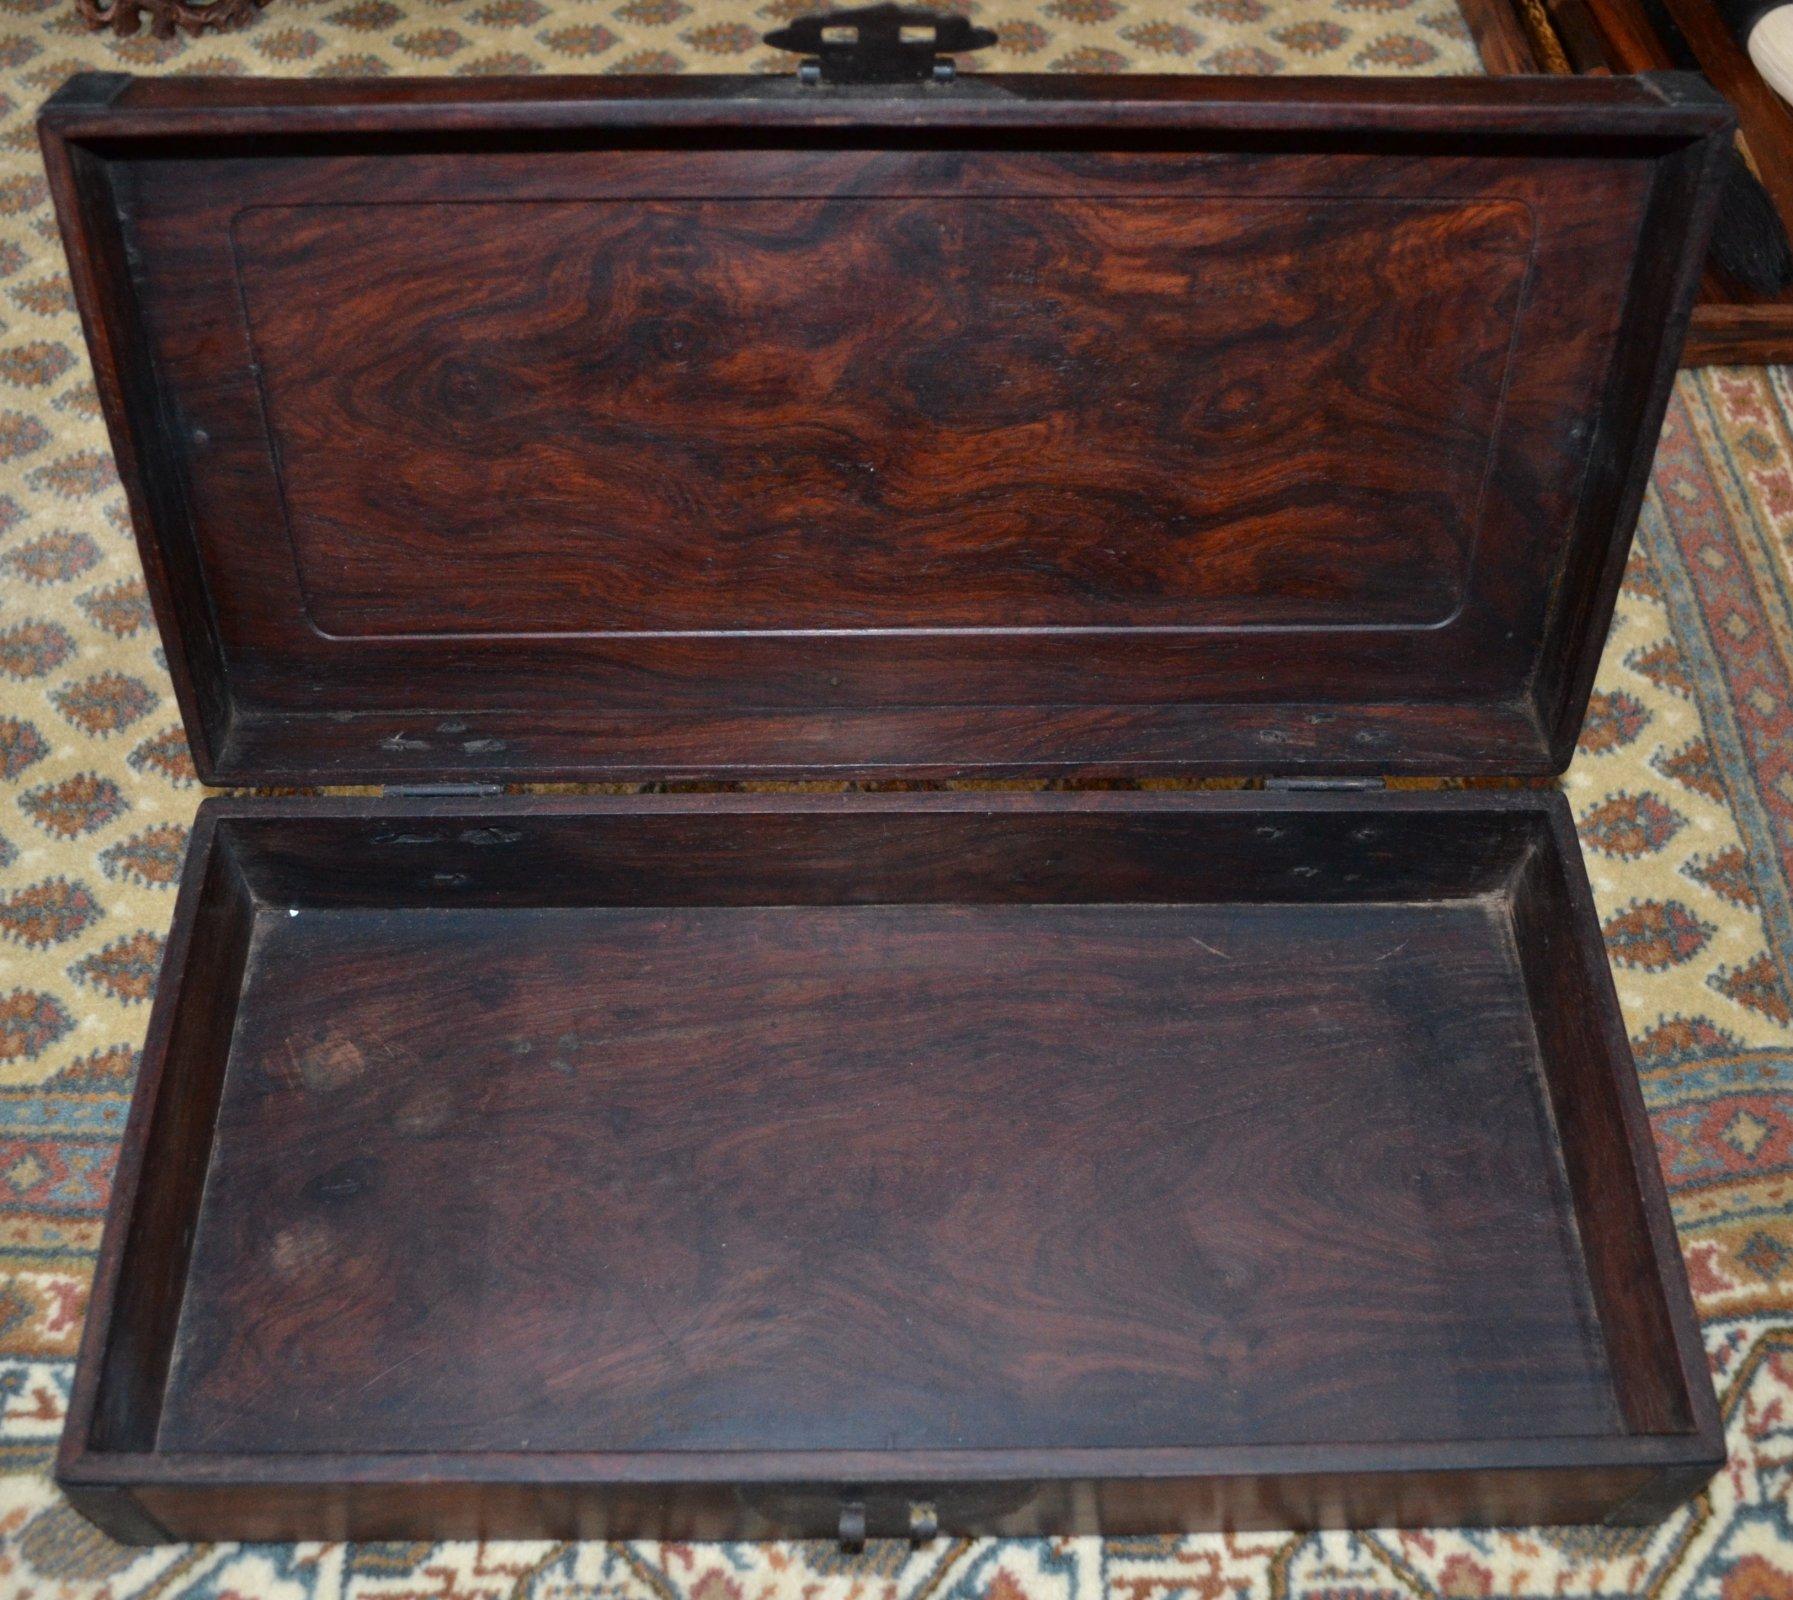 Chinese wooden hinged box